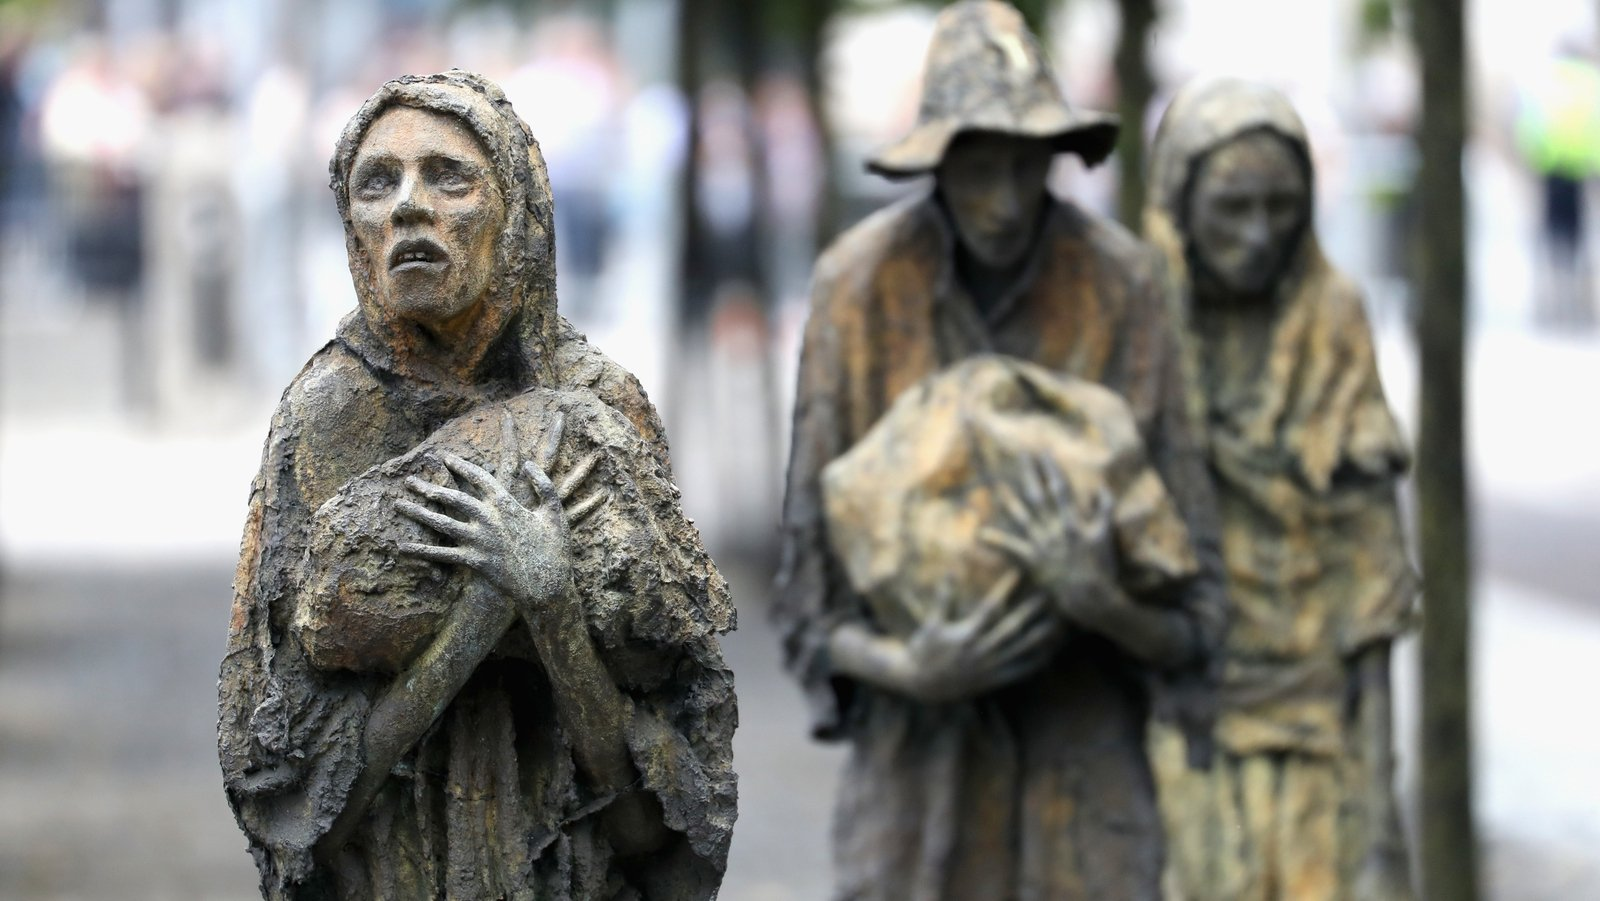 Image - The Famine Memorial, North Dock, Dublin.